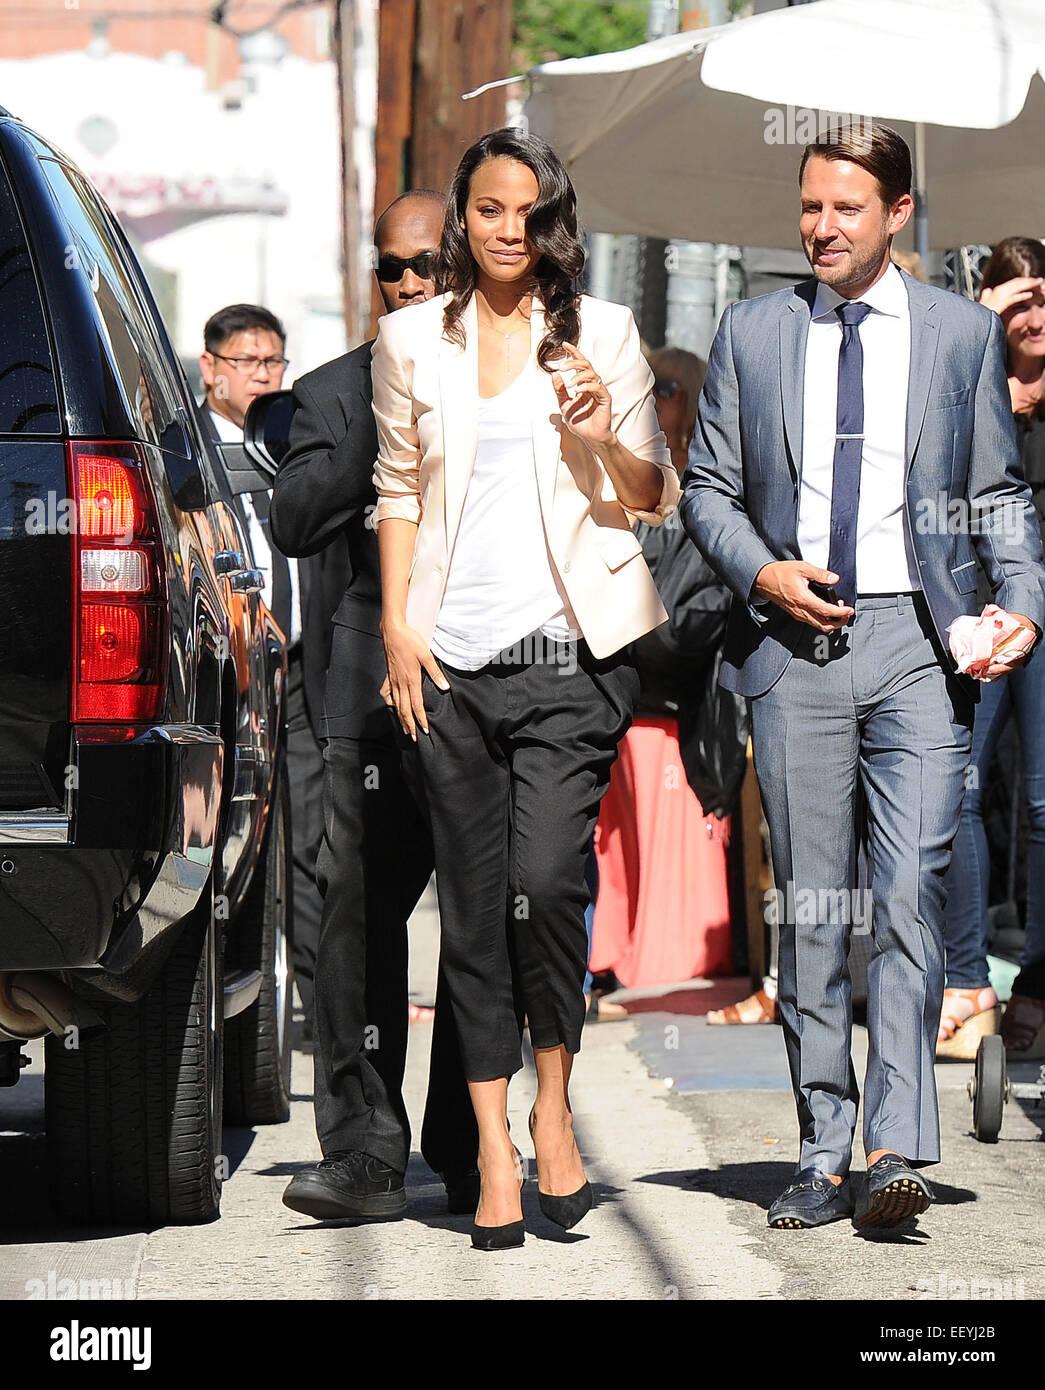 Zoe Saldana Arrives In Maternity Wear At Jimmy Kimmel Live Stock Photo Alamy